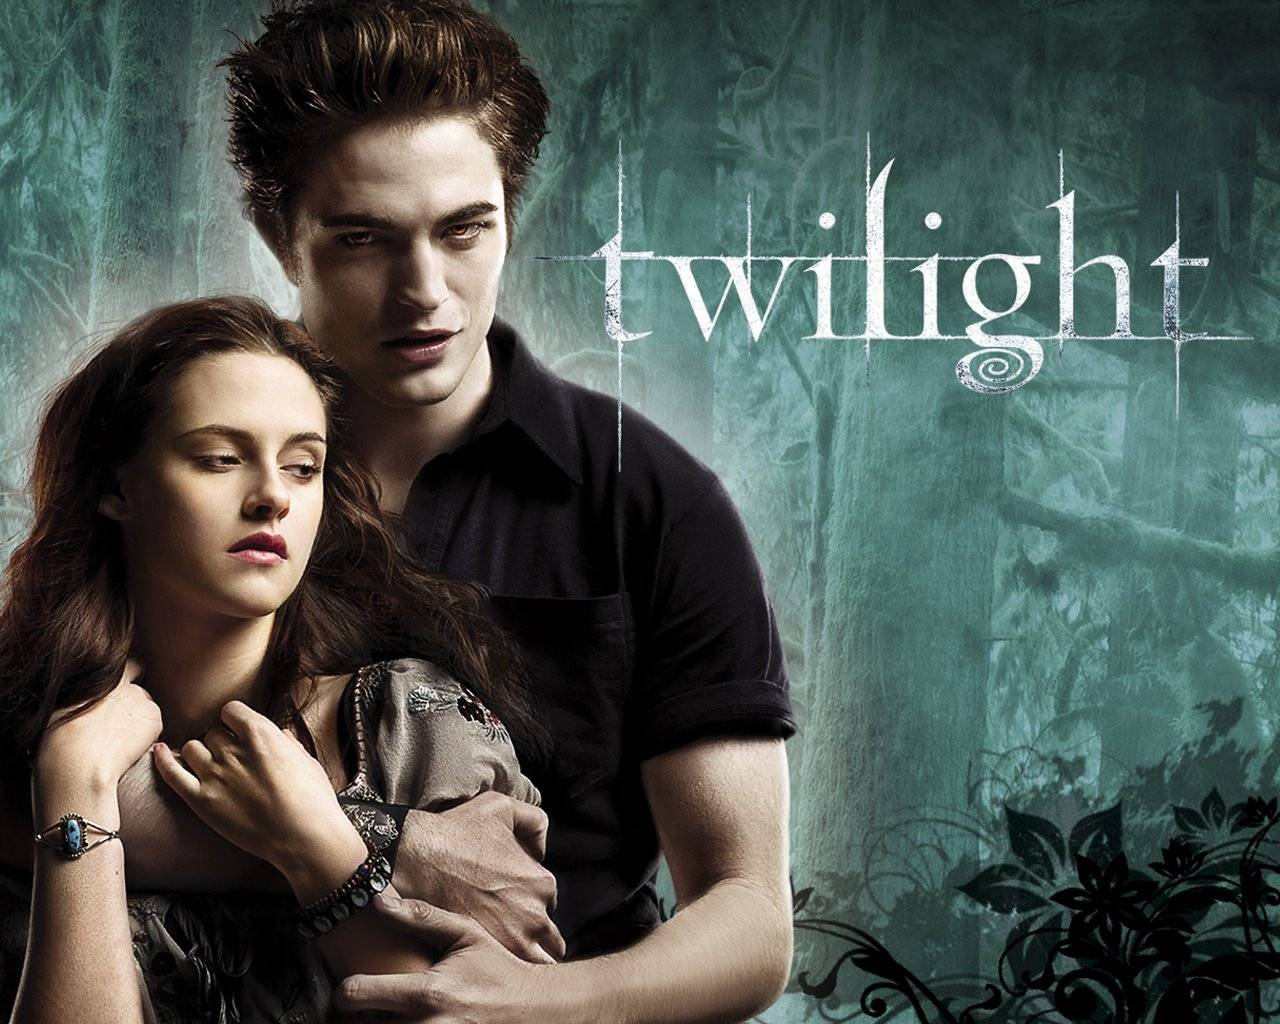 14 twilight saga wallpapers - photo #6